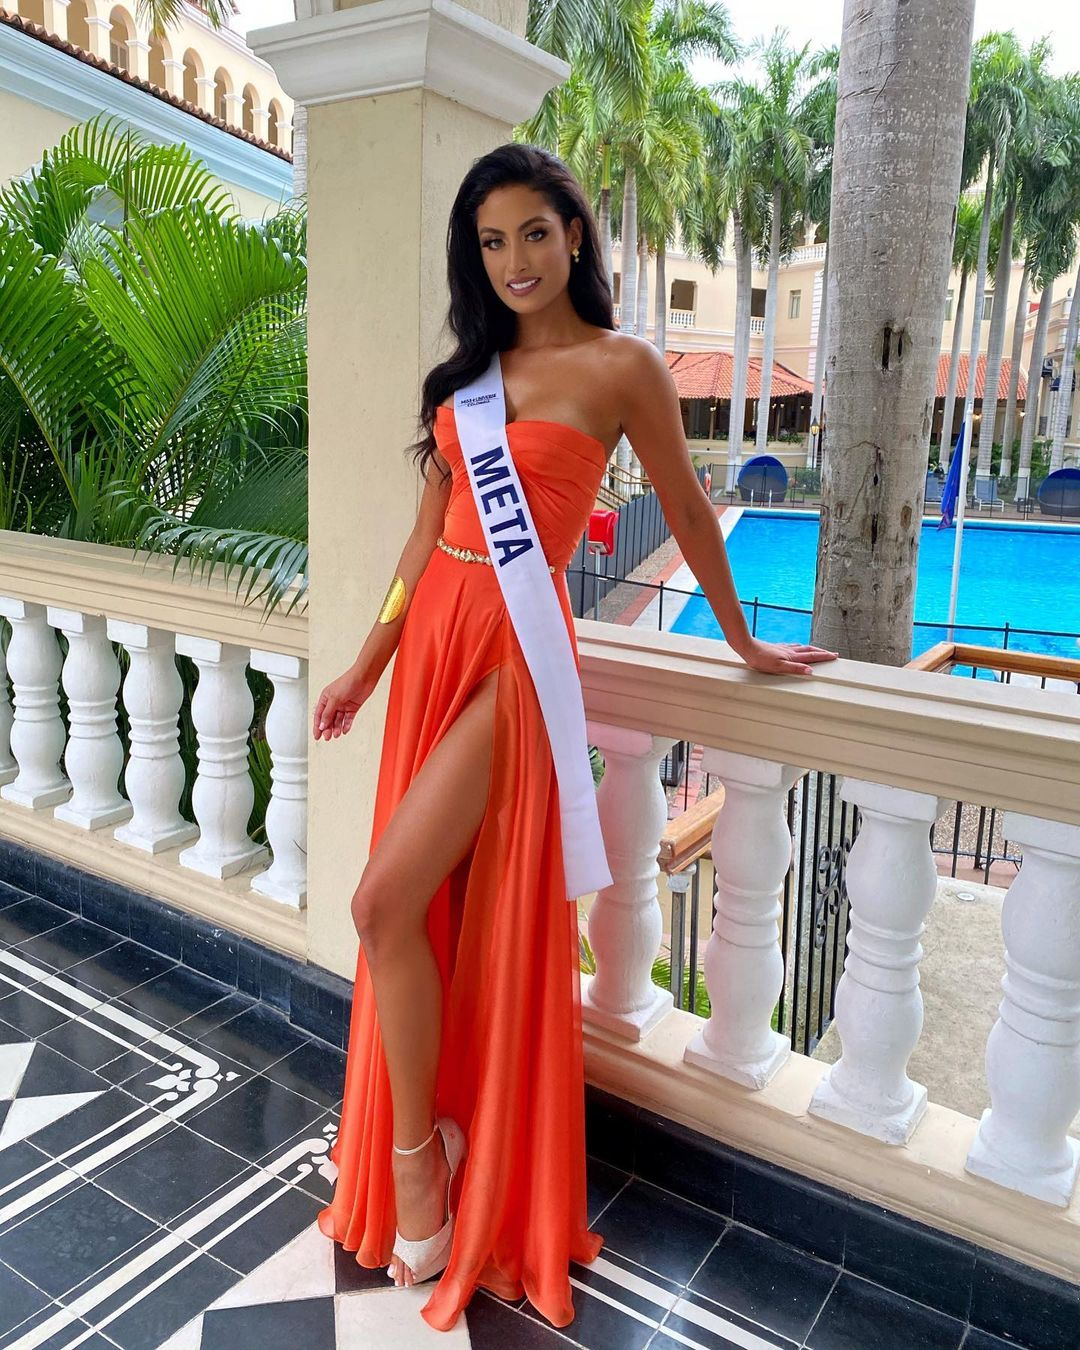 juliana franco, top 16 de miss colombia universo 2020/miss earth water 2017. - Página 21 Julifr21